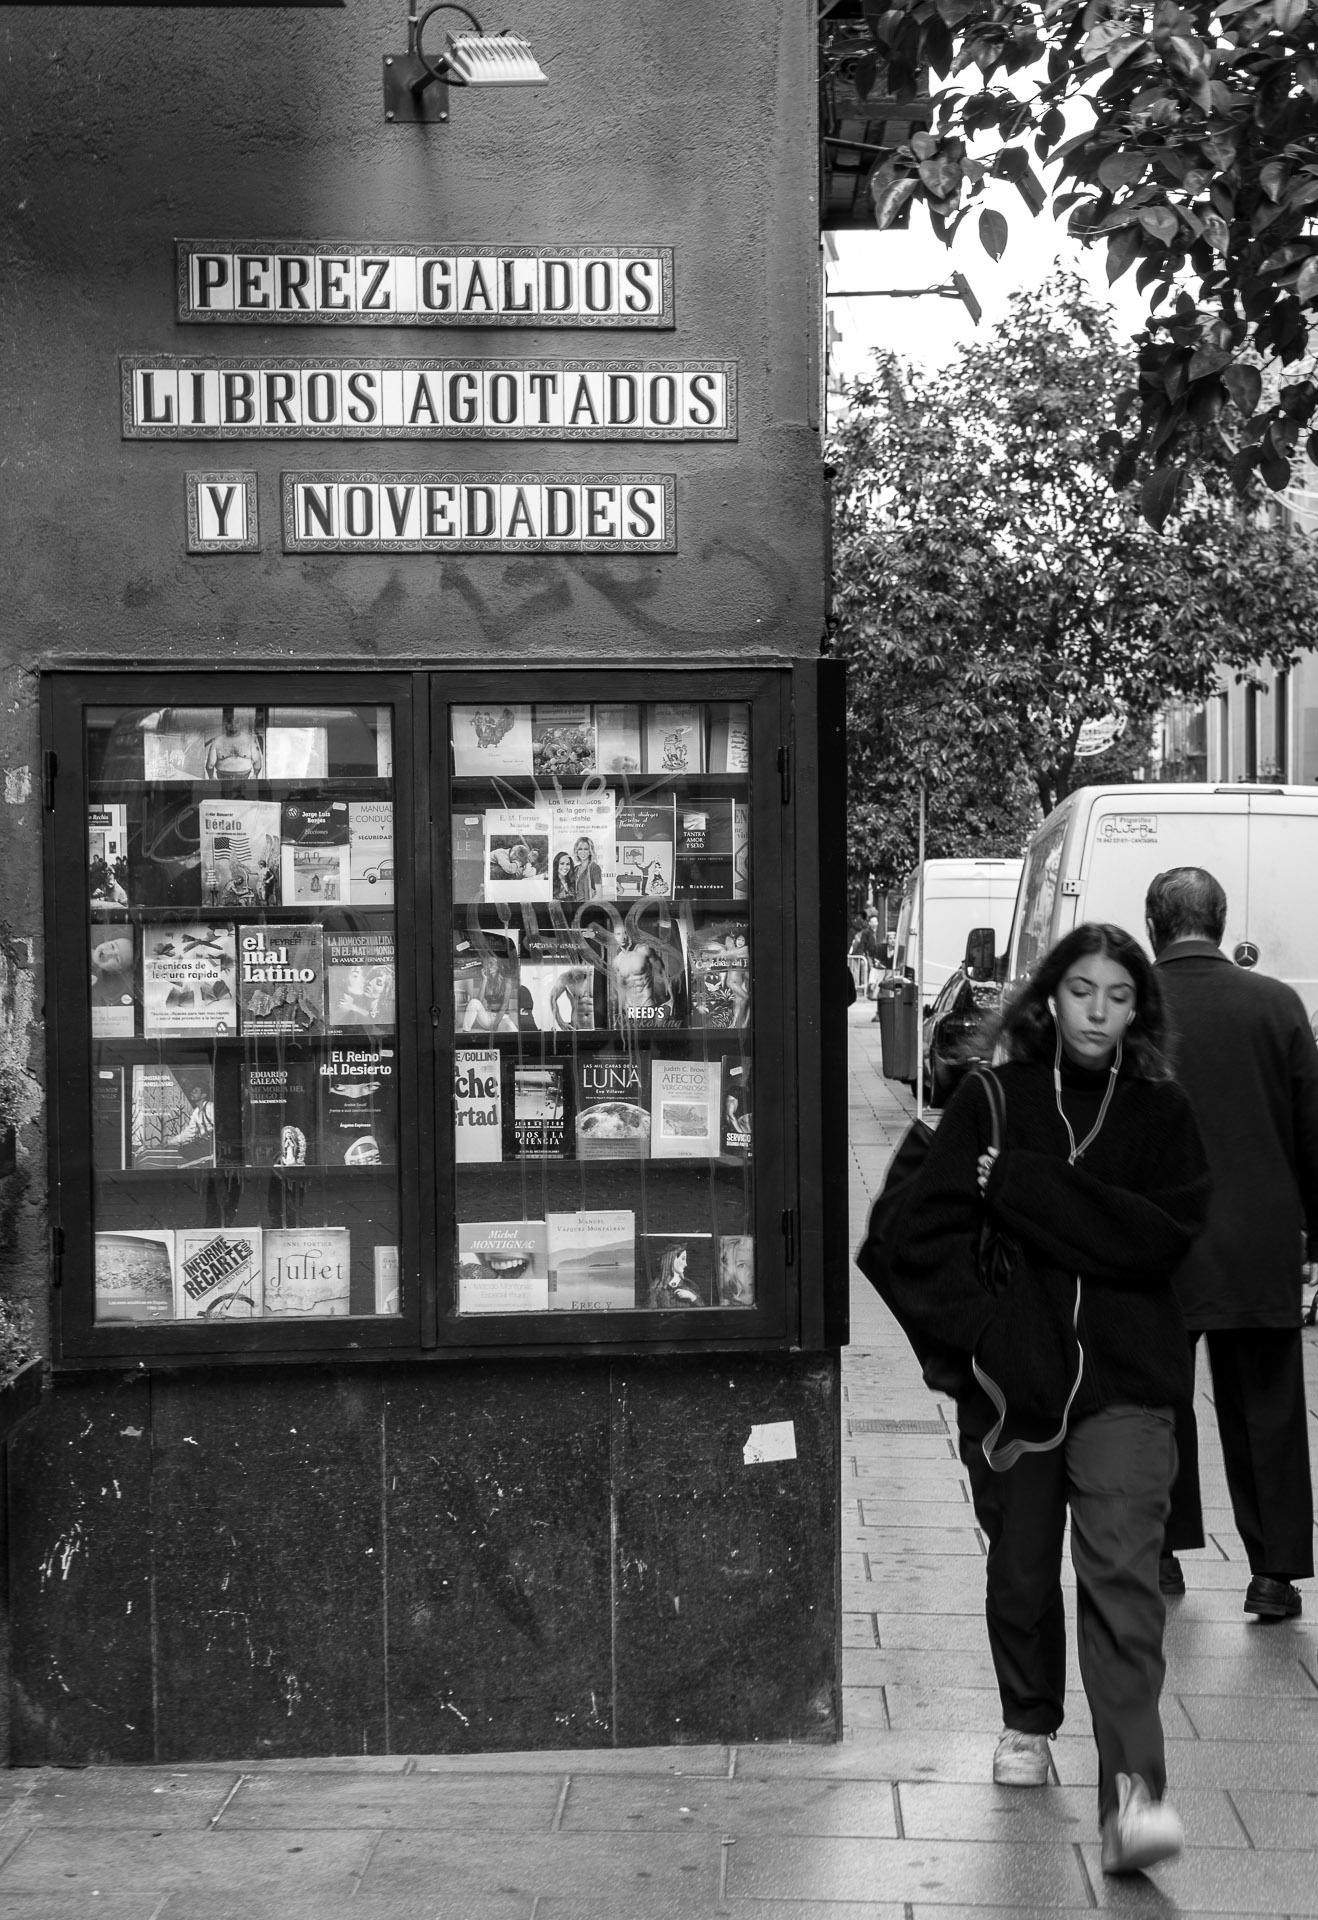 librerias-madrid-antoniomachado01.jpg